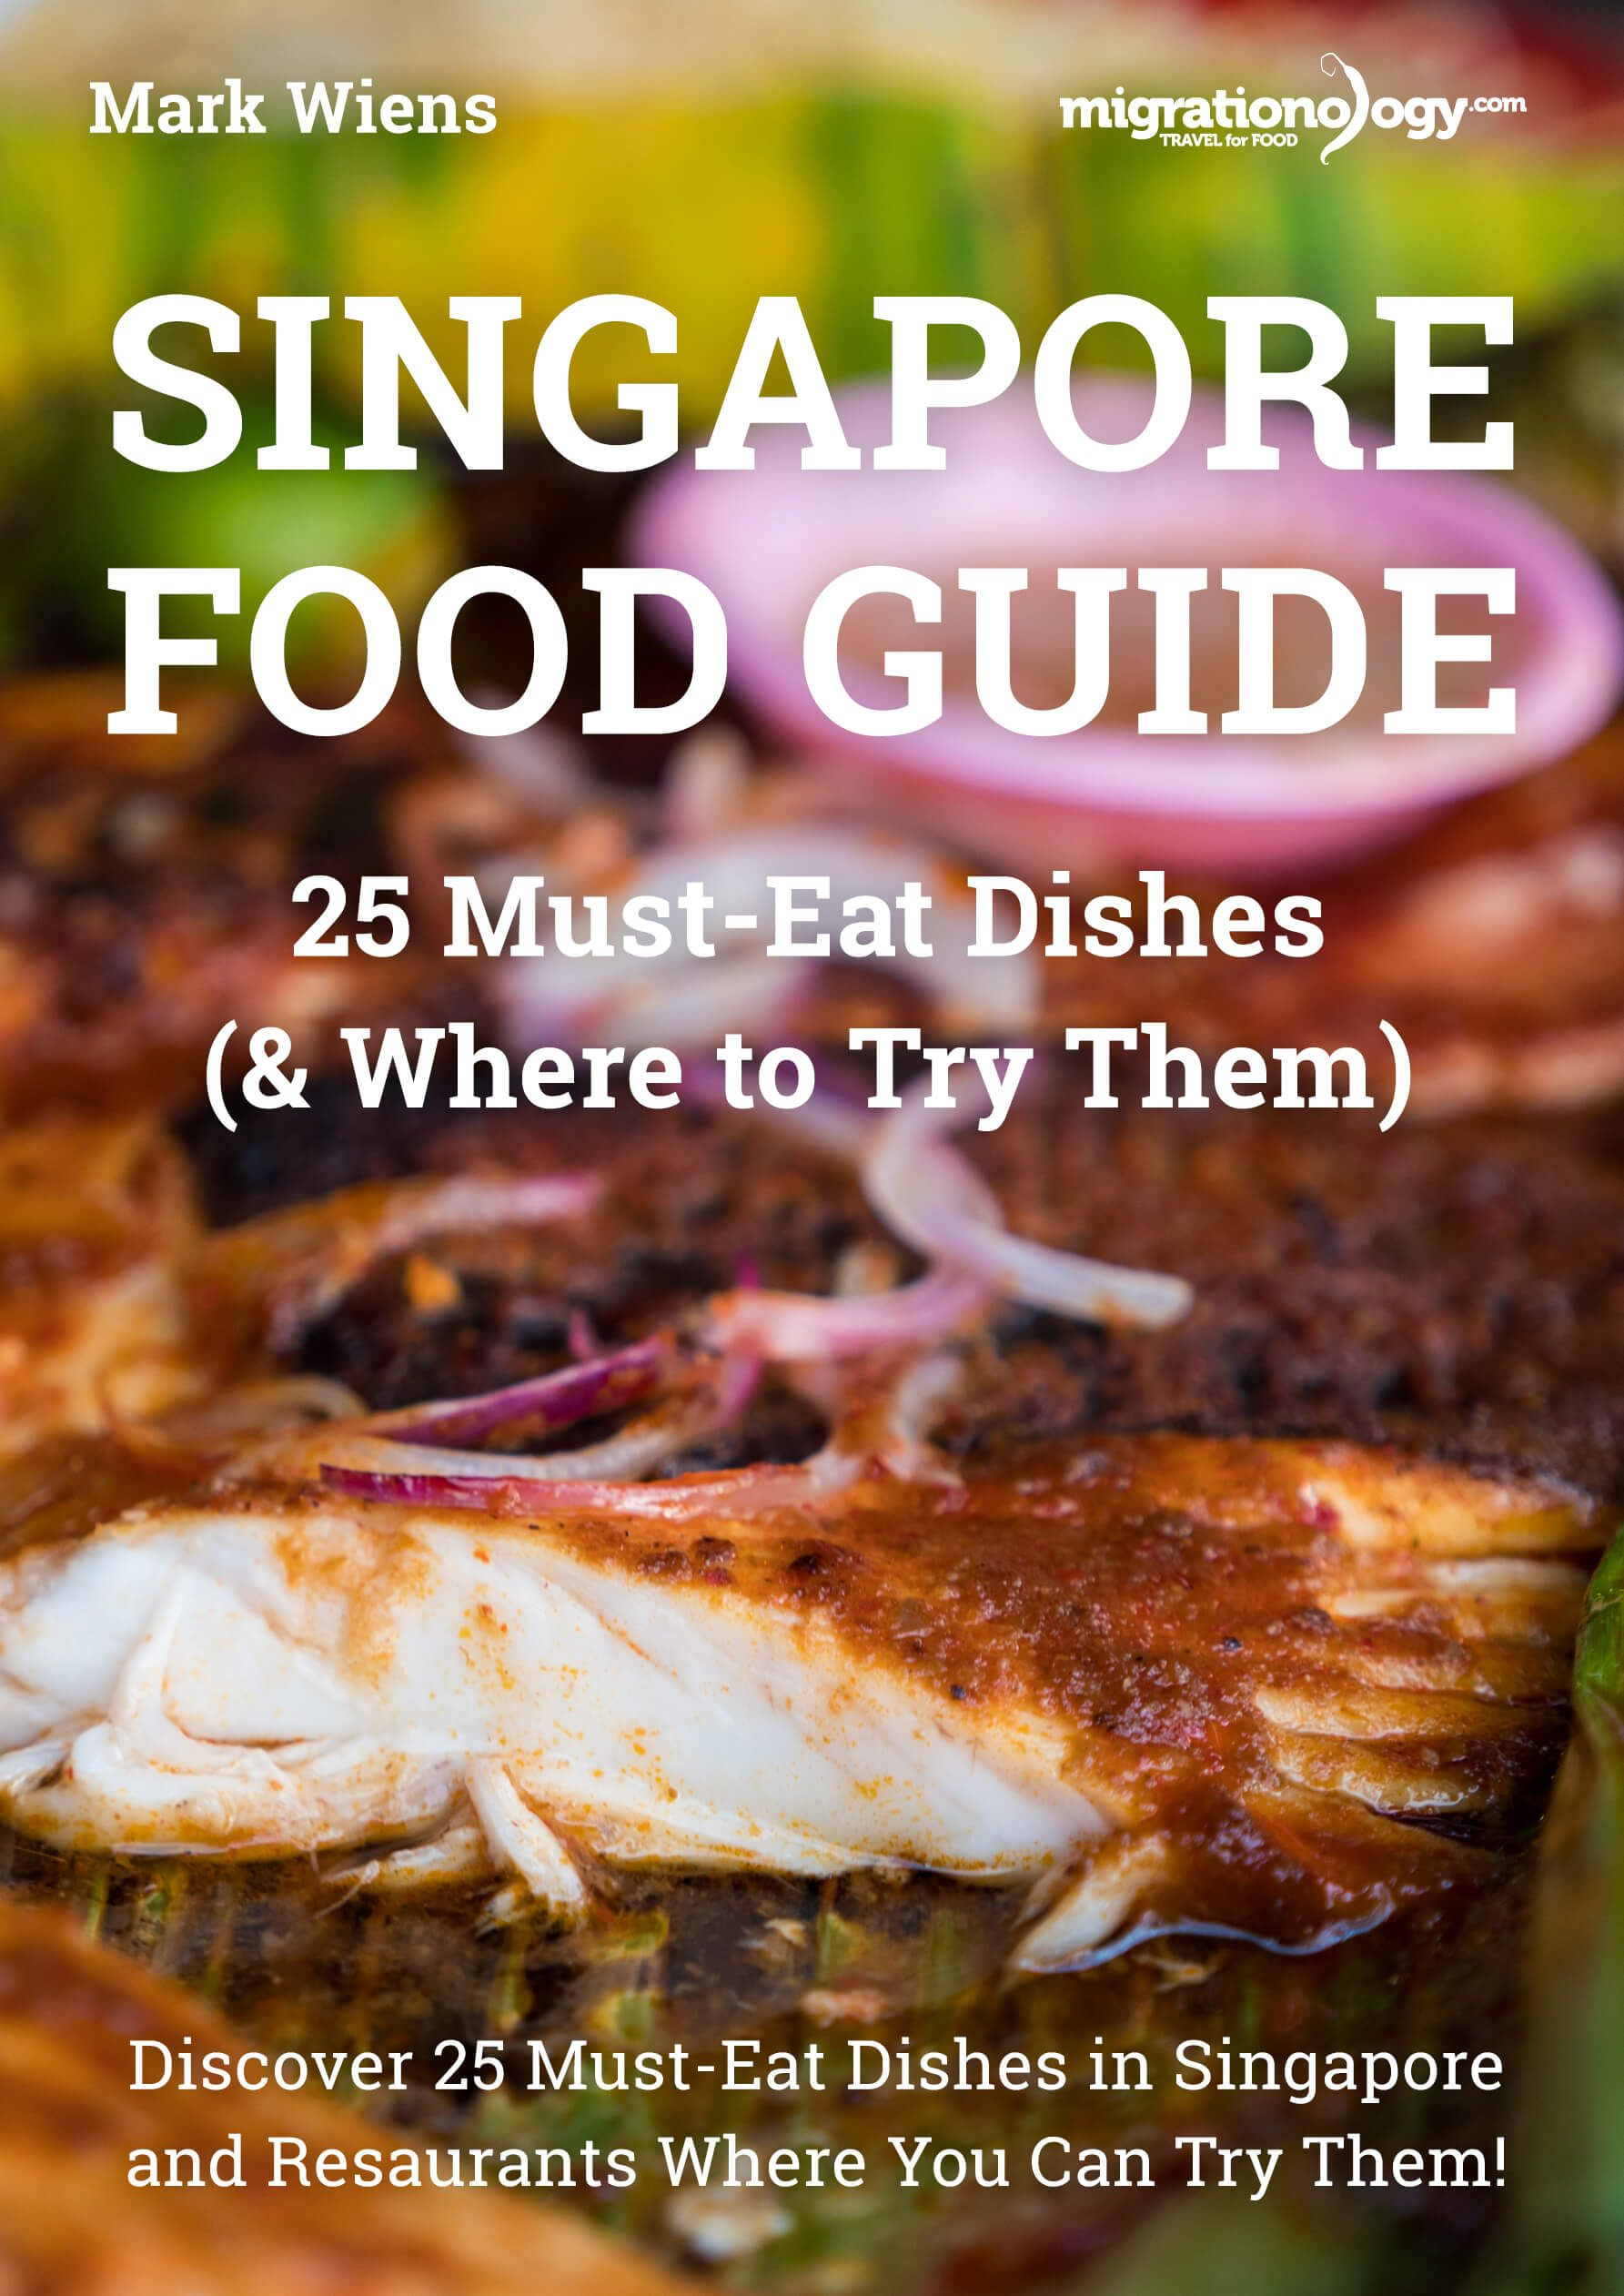 Singapore Food Guide 25 Must Eat Dishes Where To Try Them Essen Reise Feinschmecker Reise Lebensmittel Essen